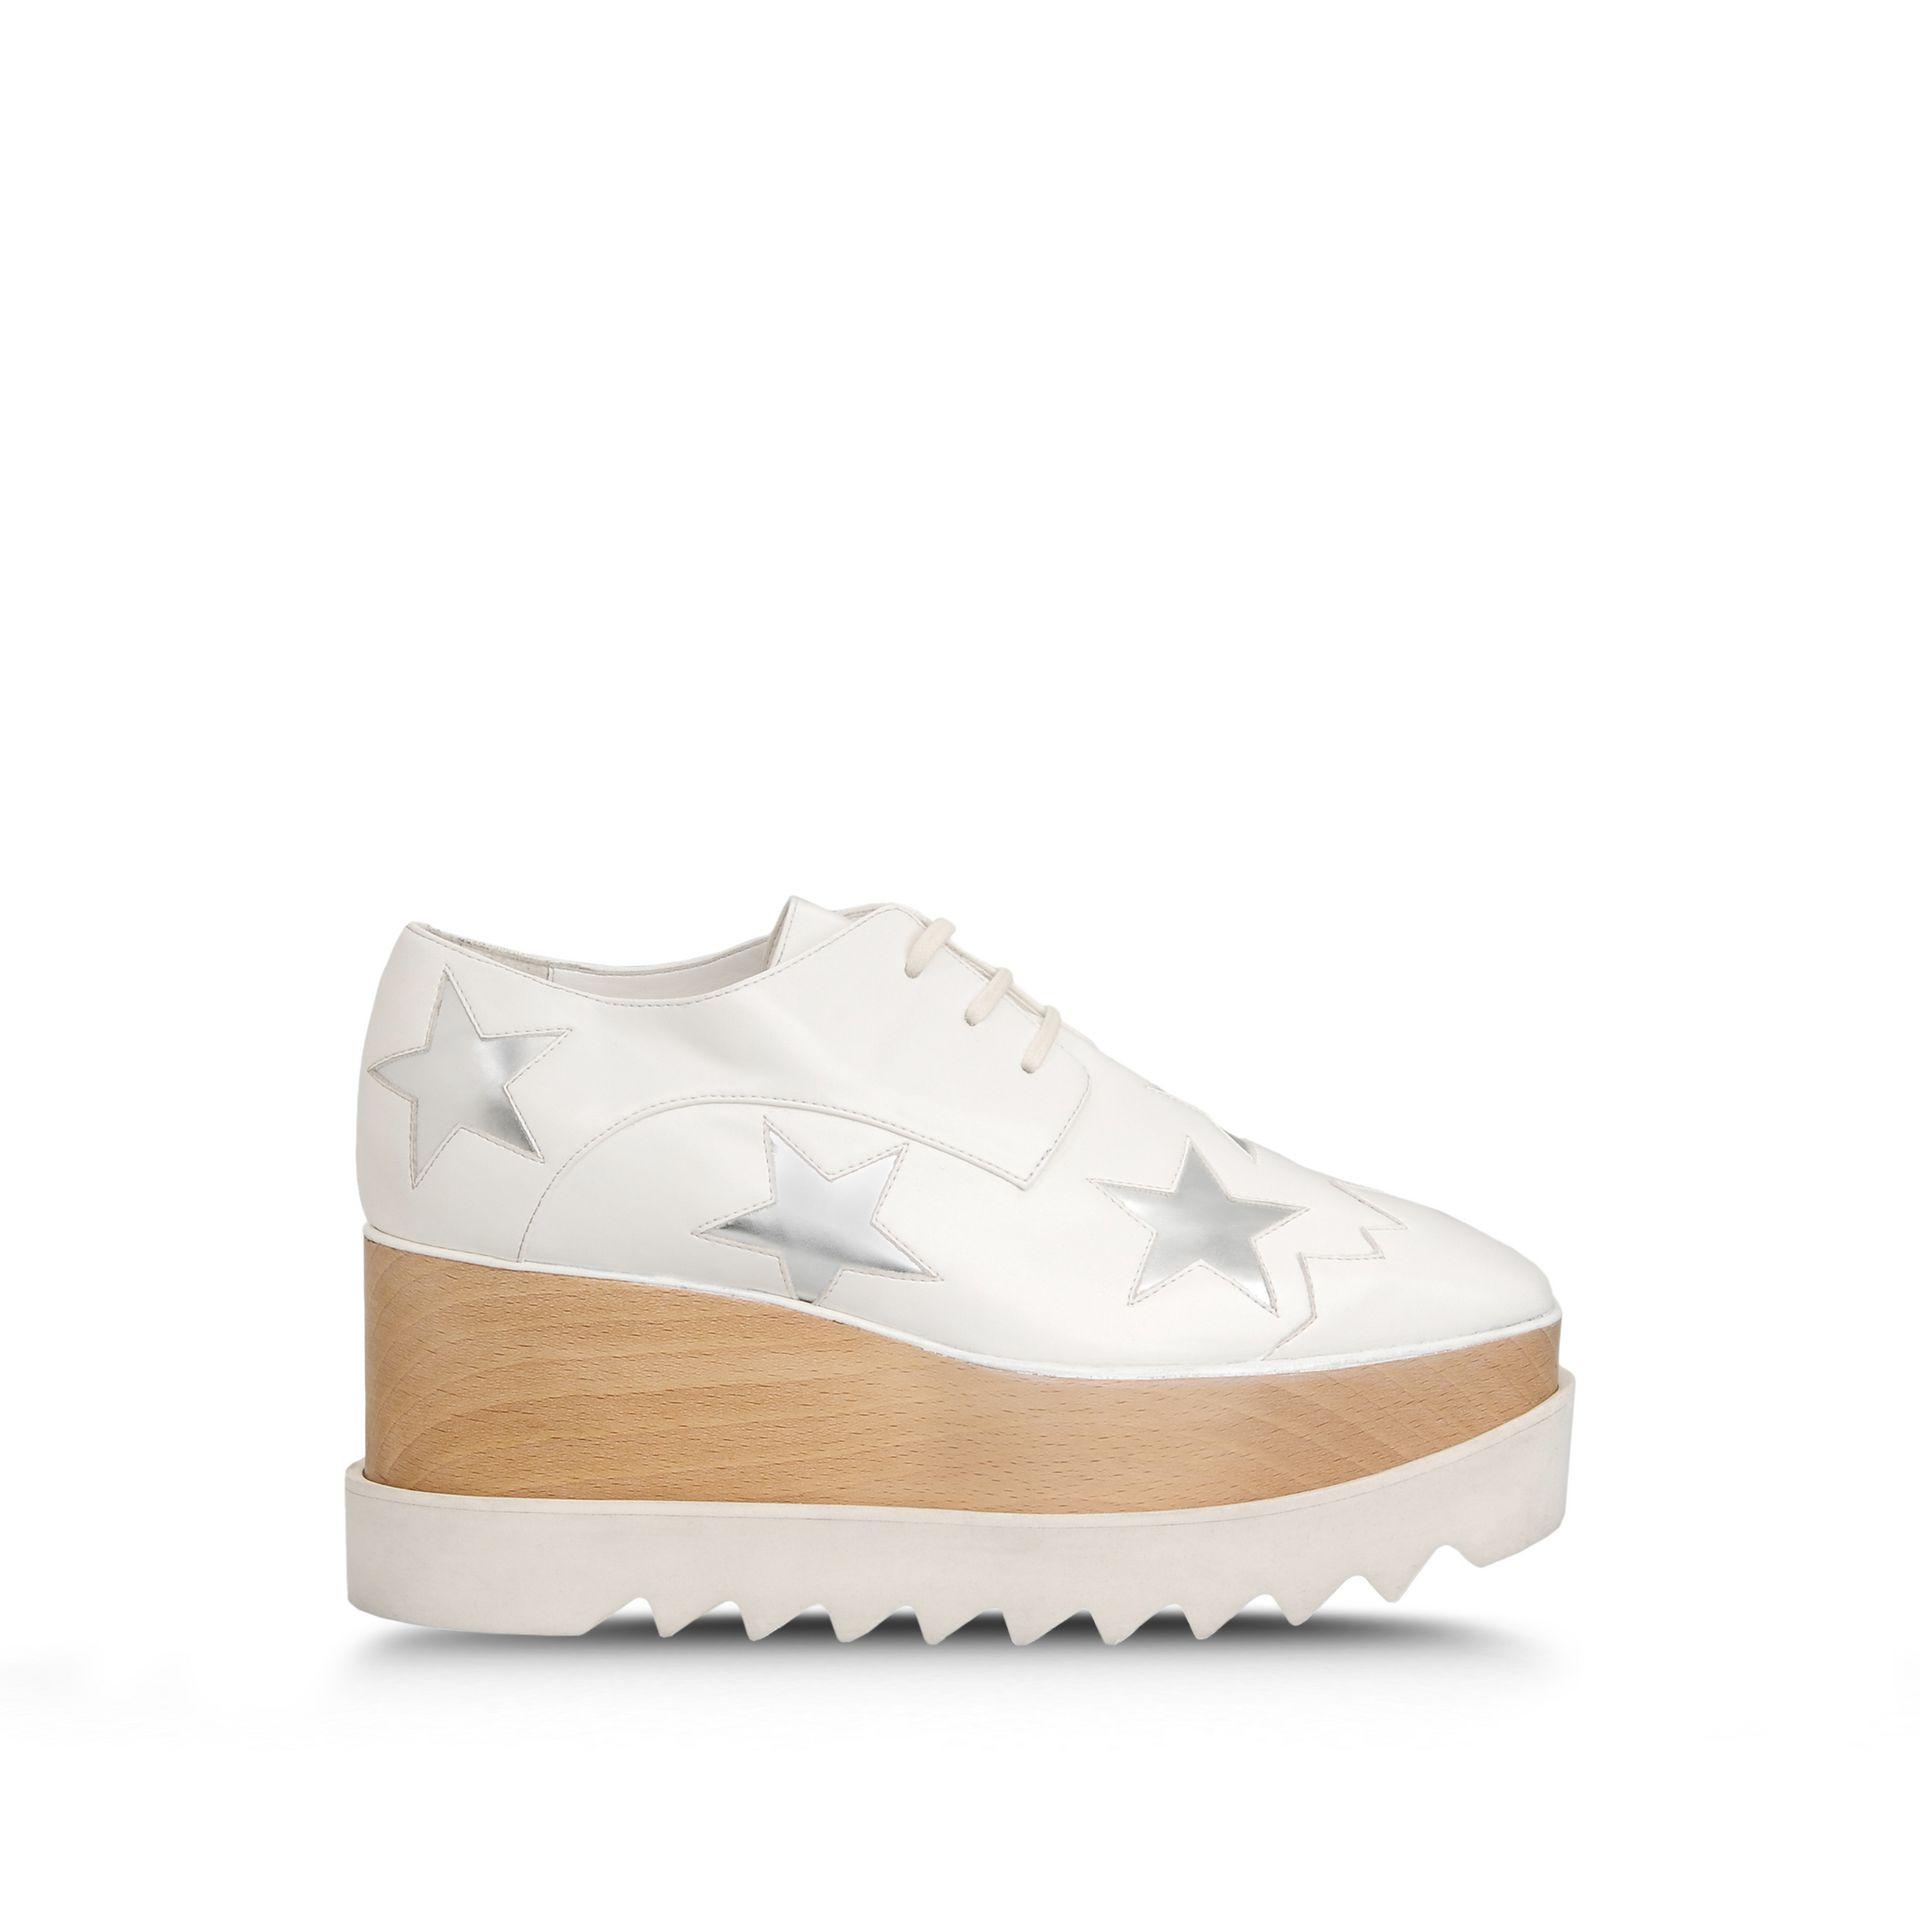 Elyse star platform sneakers - White Stella McCartney 3B3GNrPK